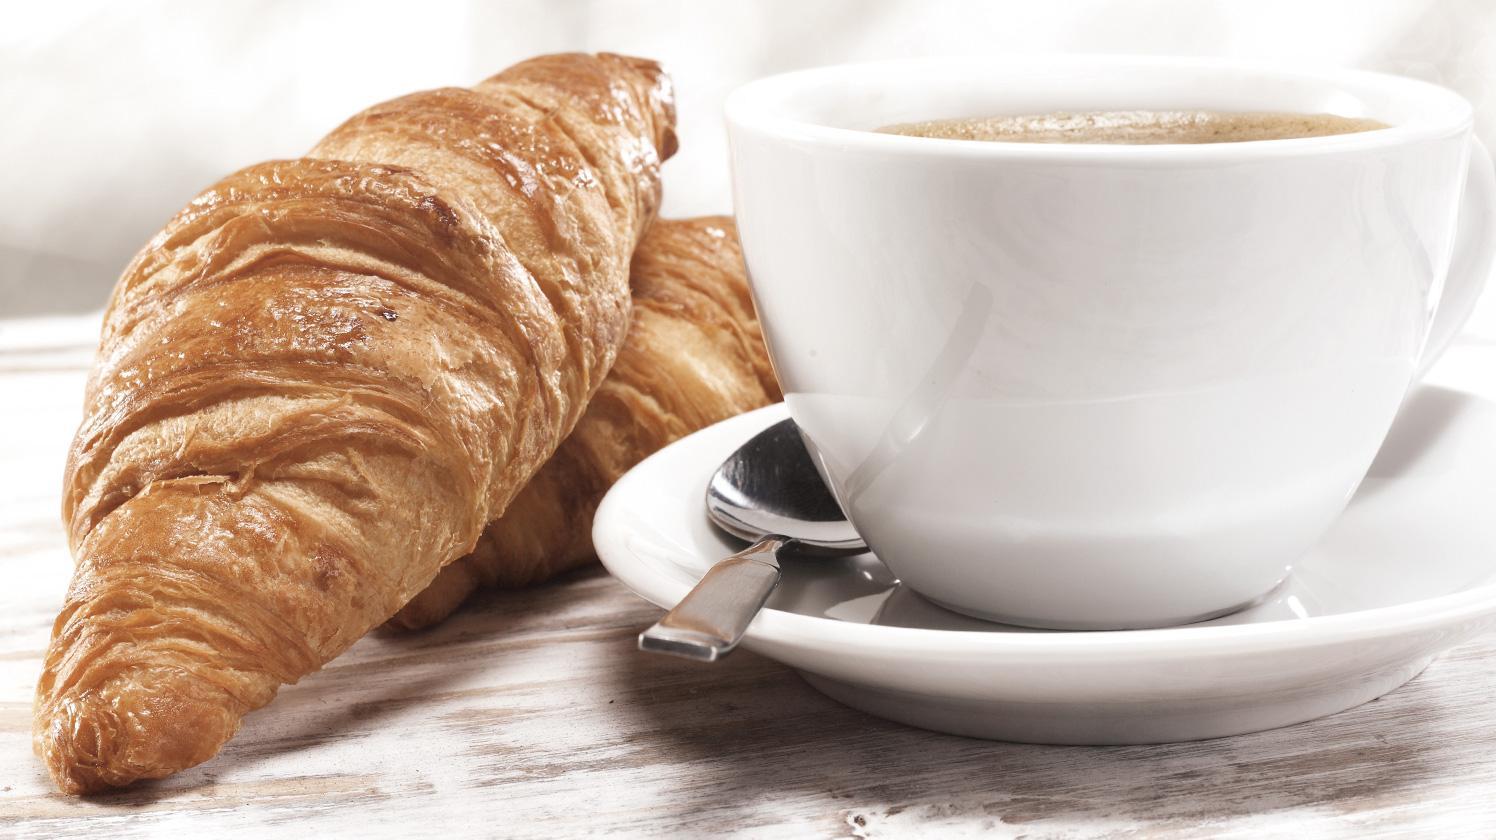 BRITA water coffee shop bakery croissants coffee